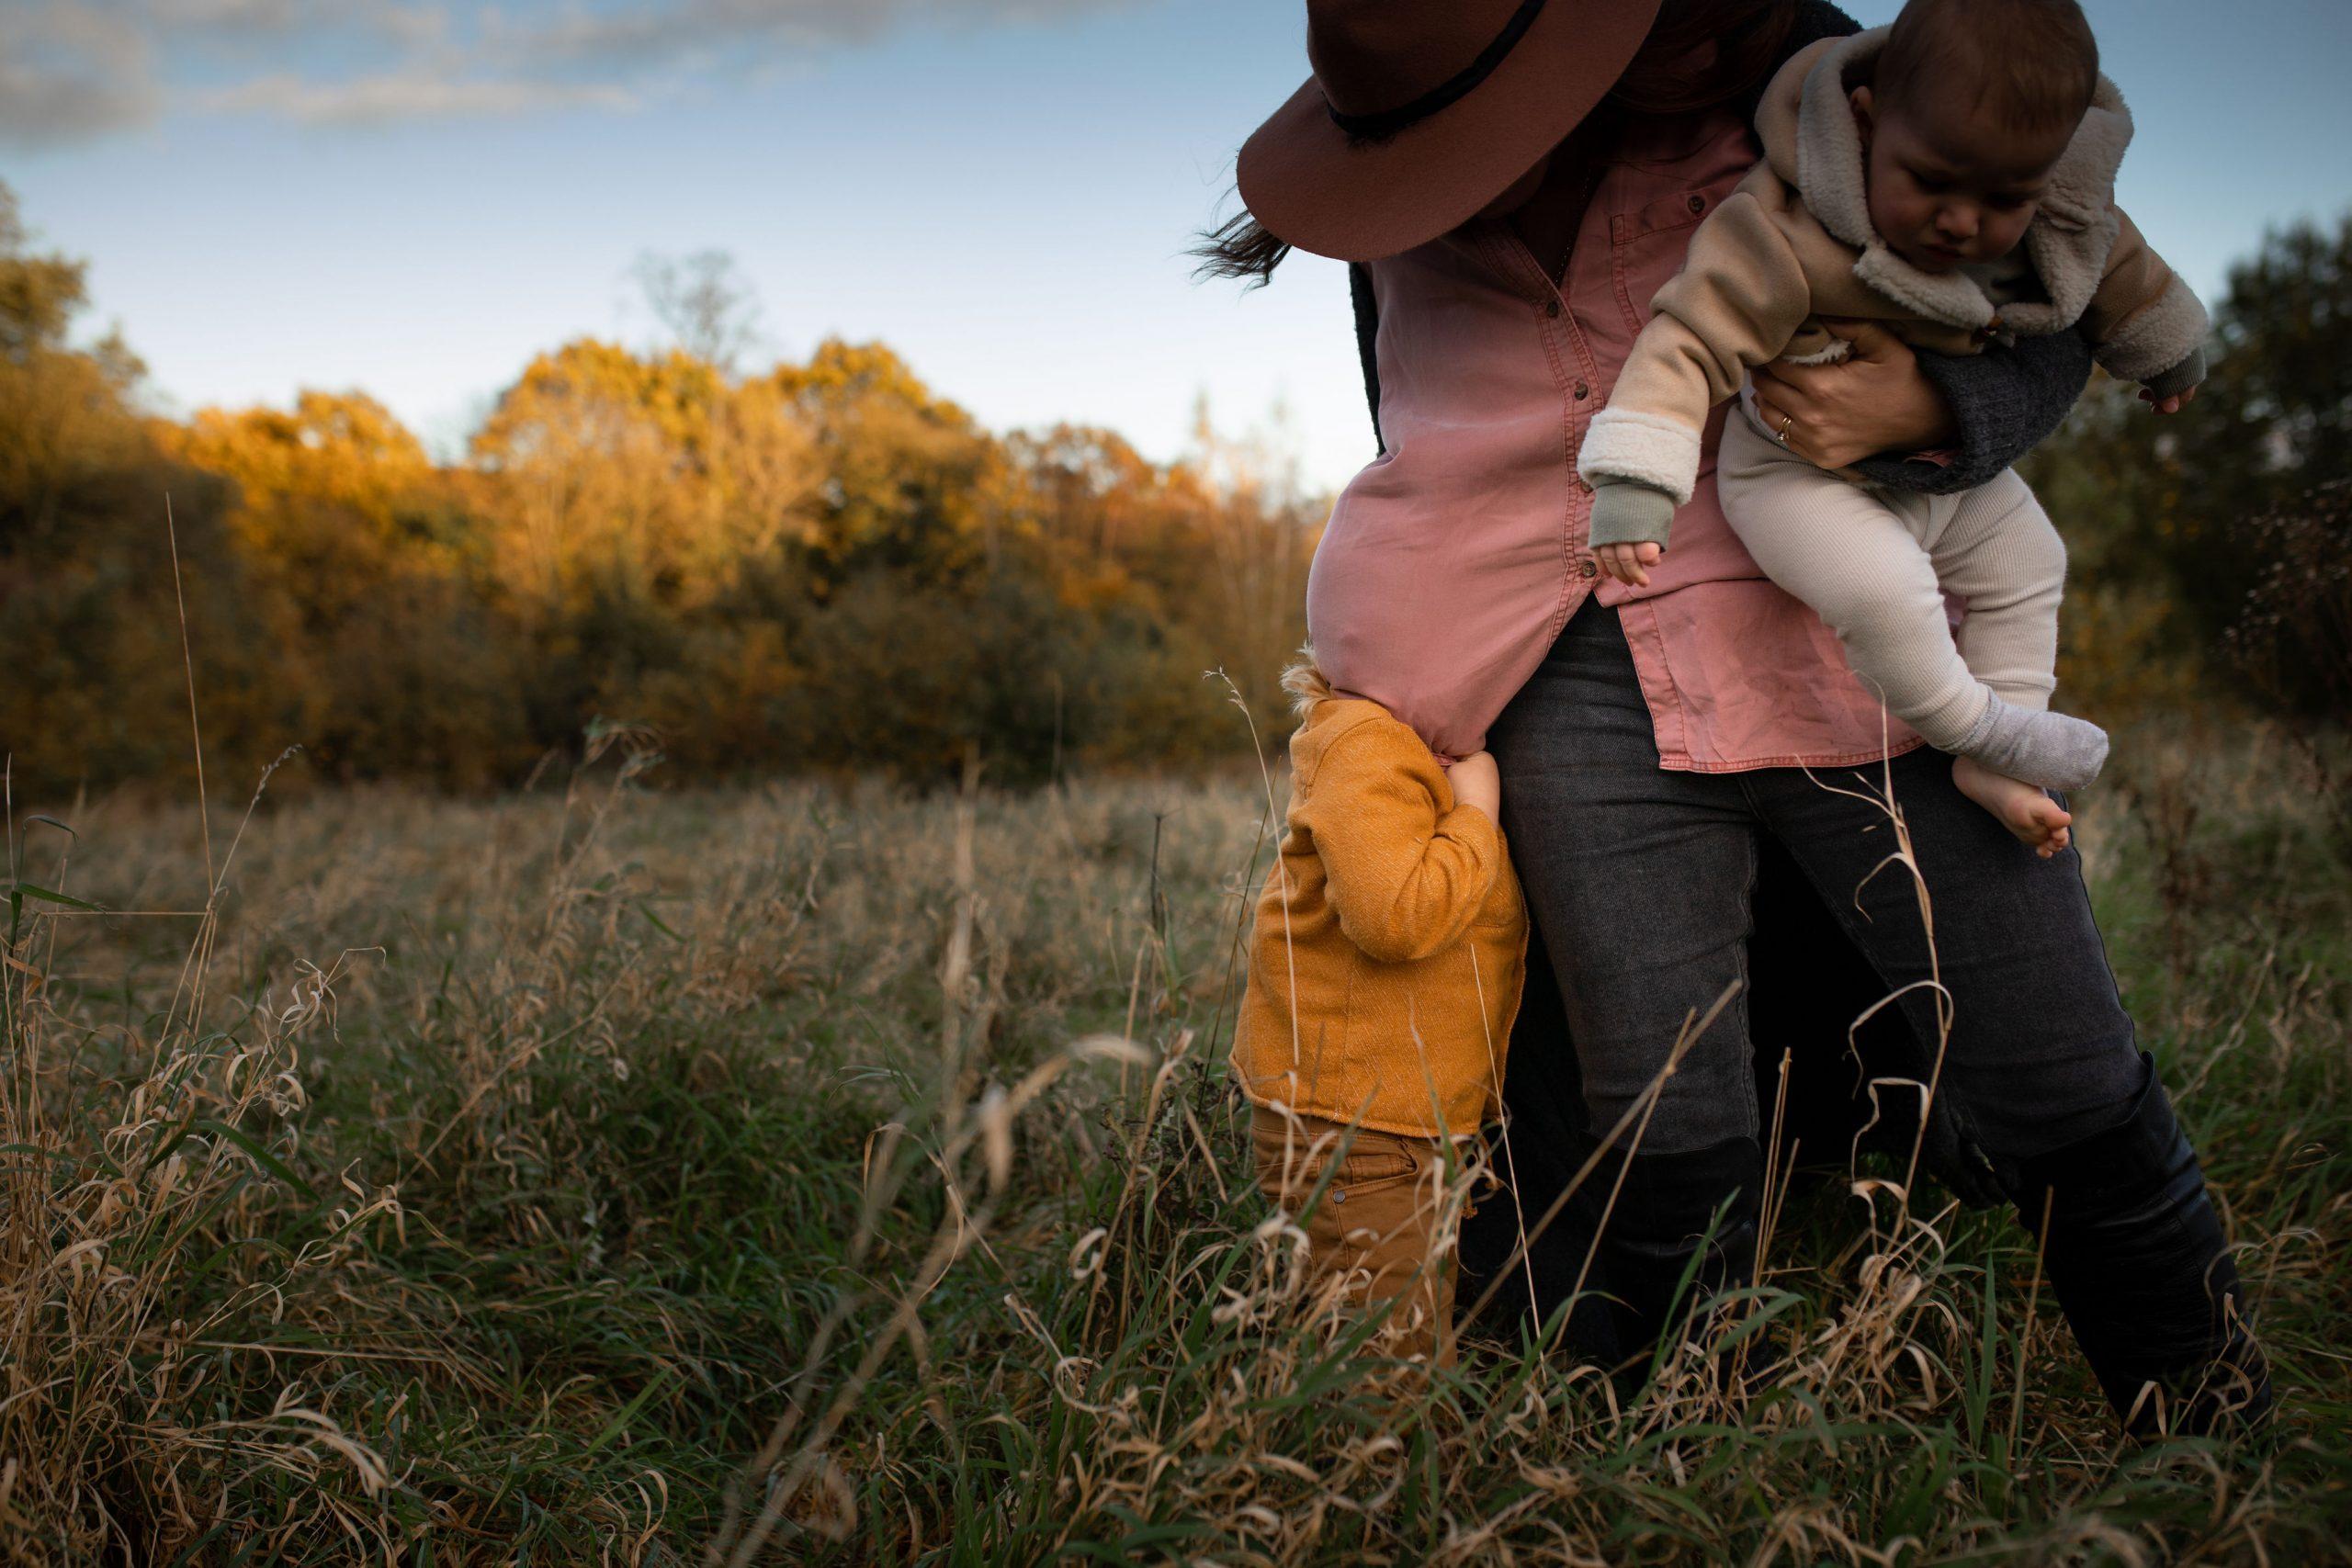 Real life motherhood